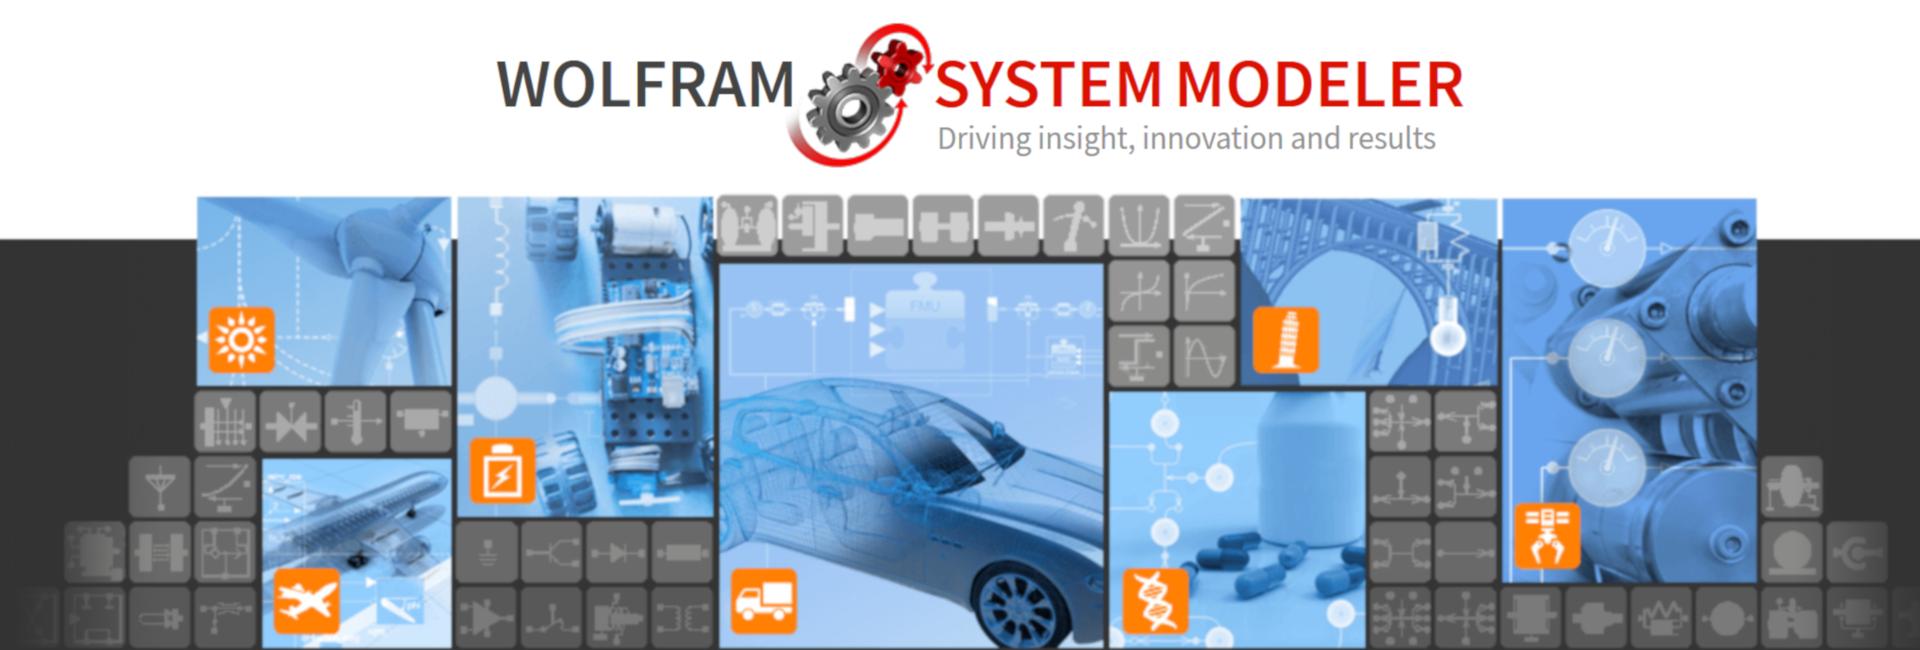 Nowa wersja Wolfram SystemModeler 12